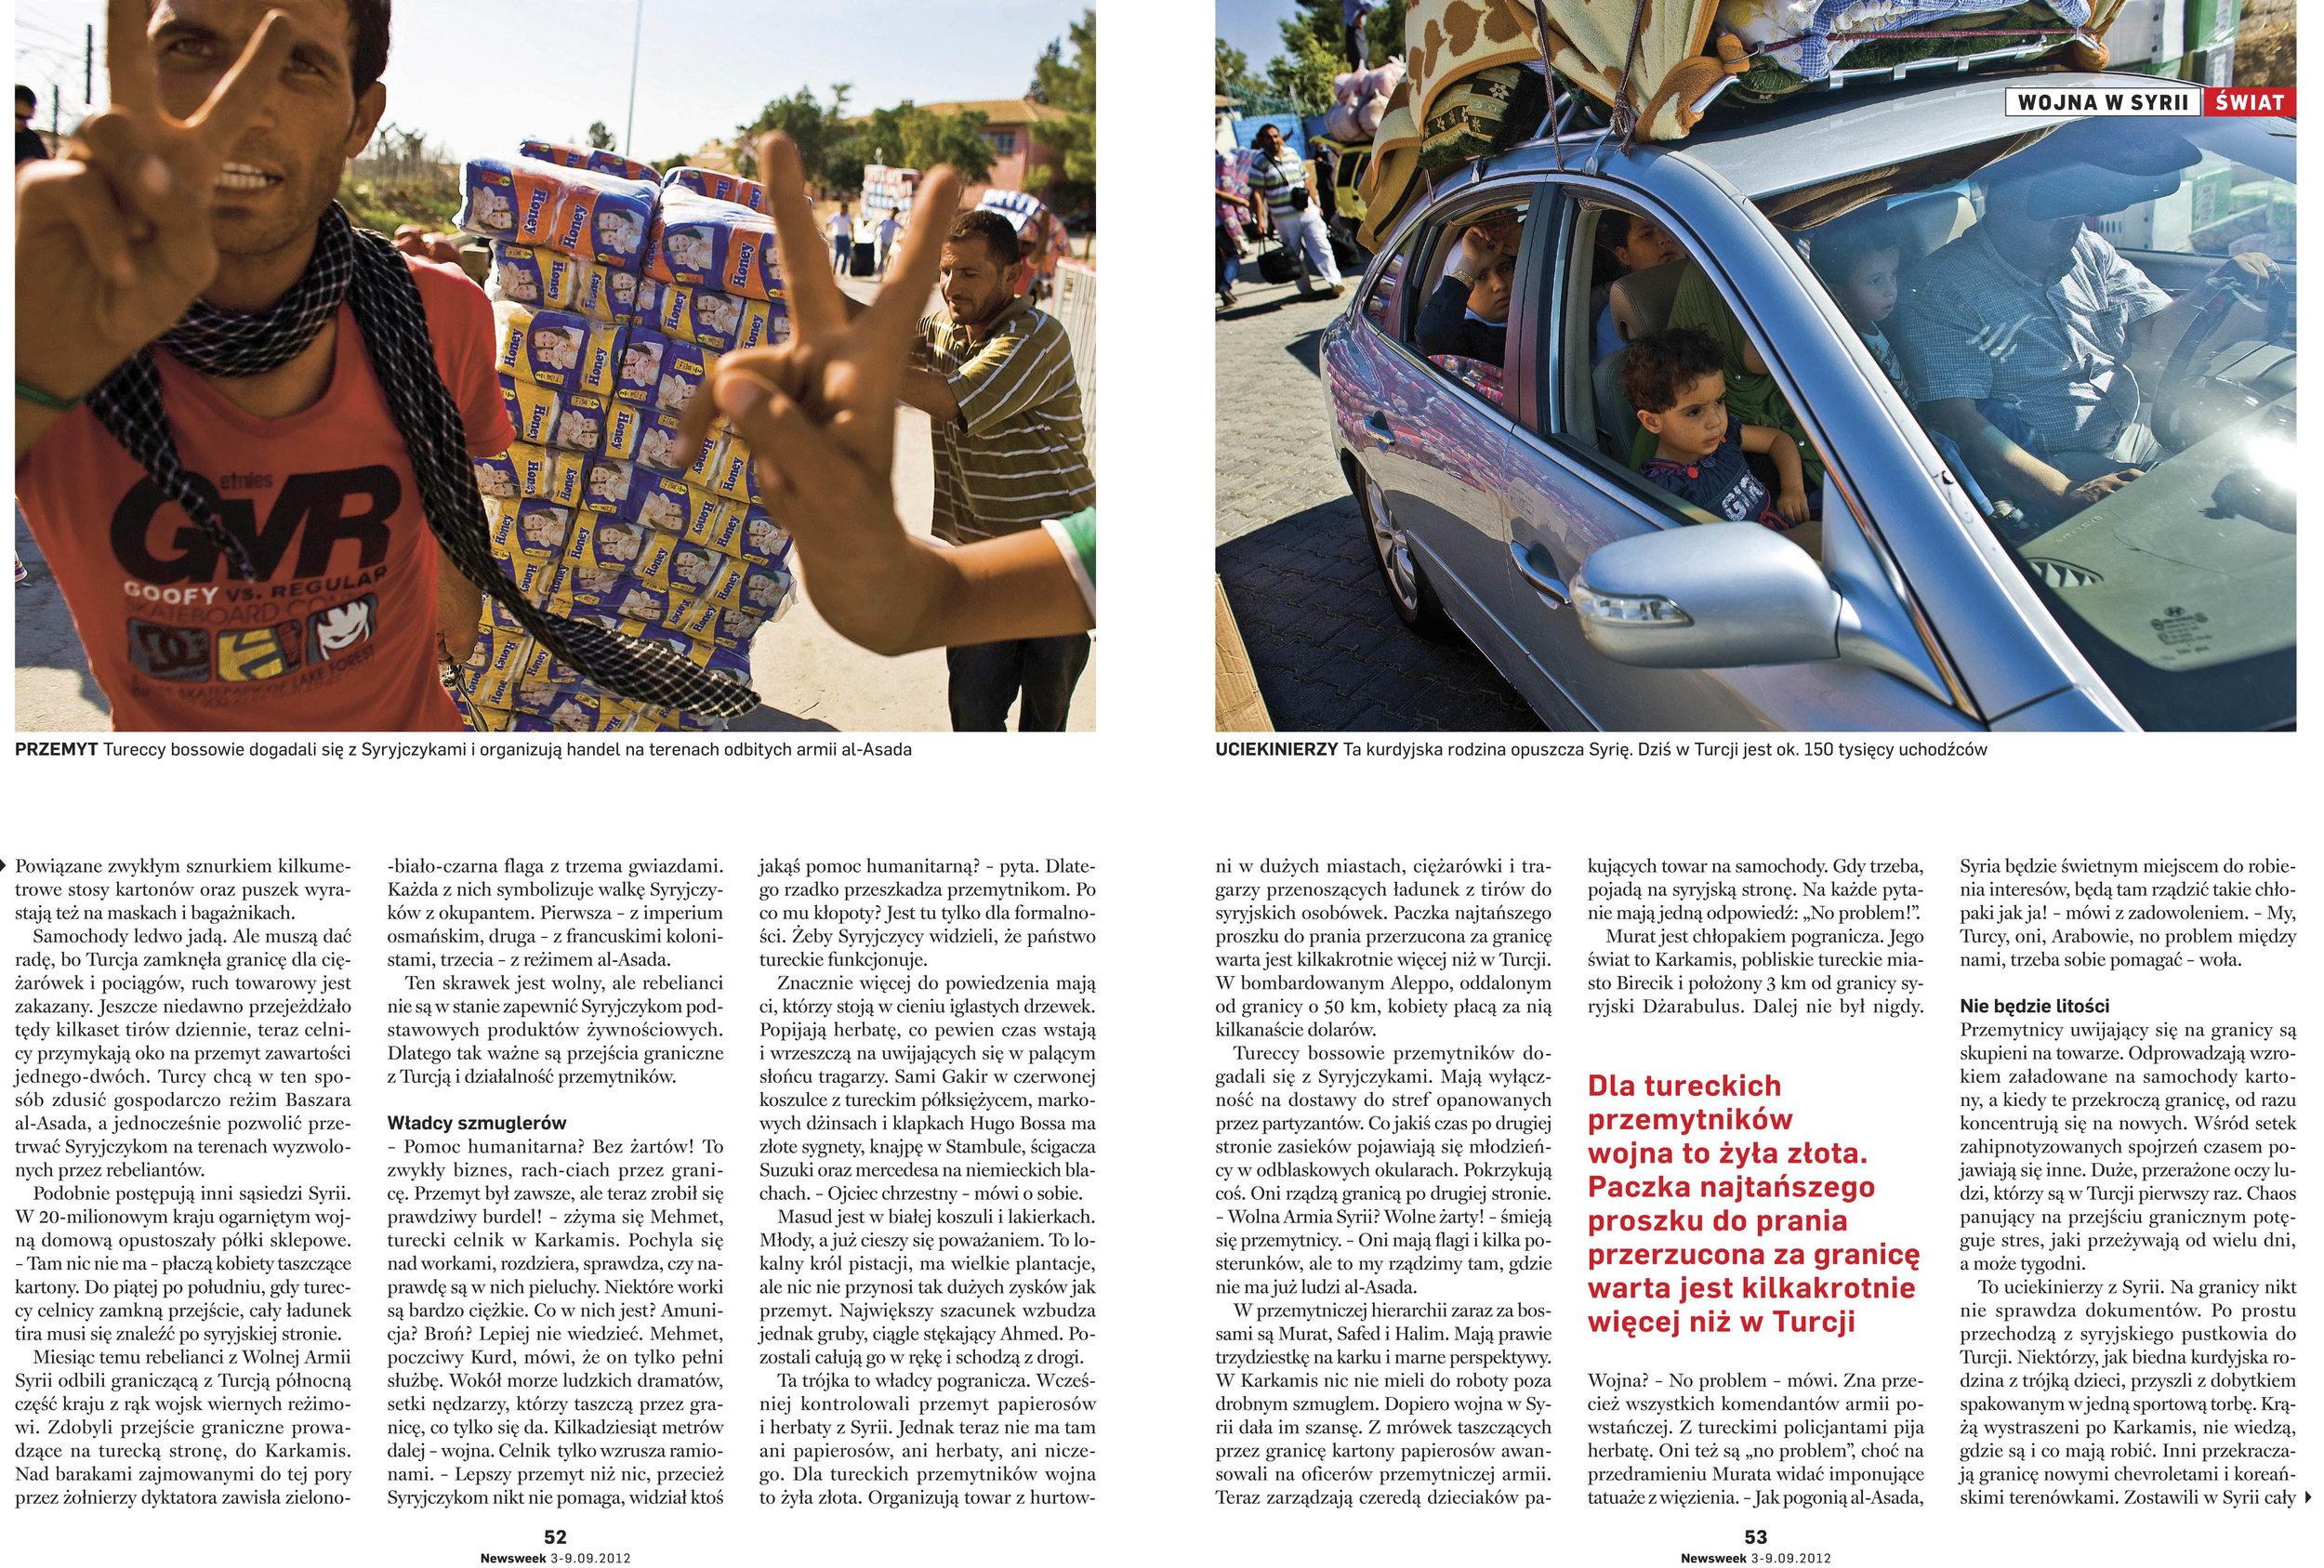 NEWSWEEK 2012 ON THE SYRIAN BORDER